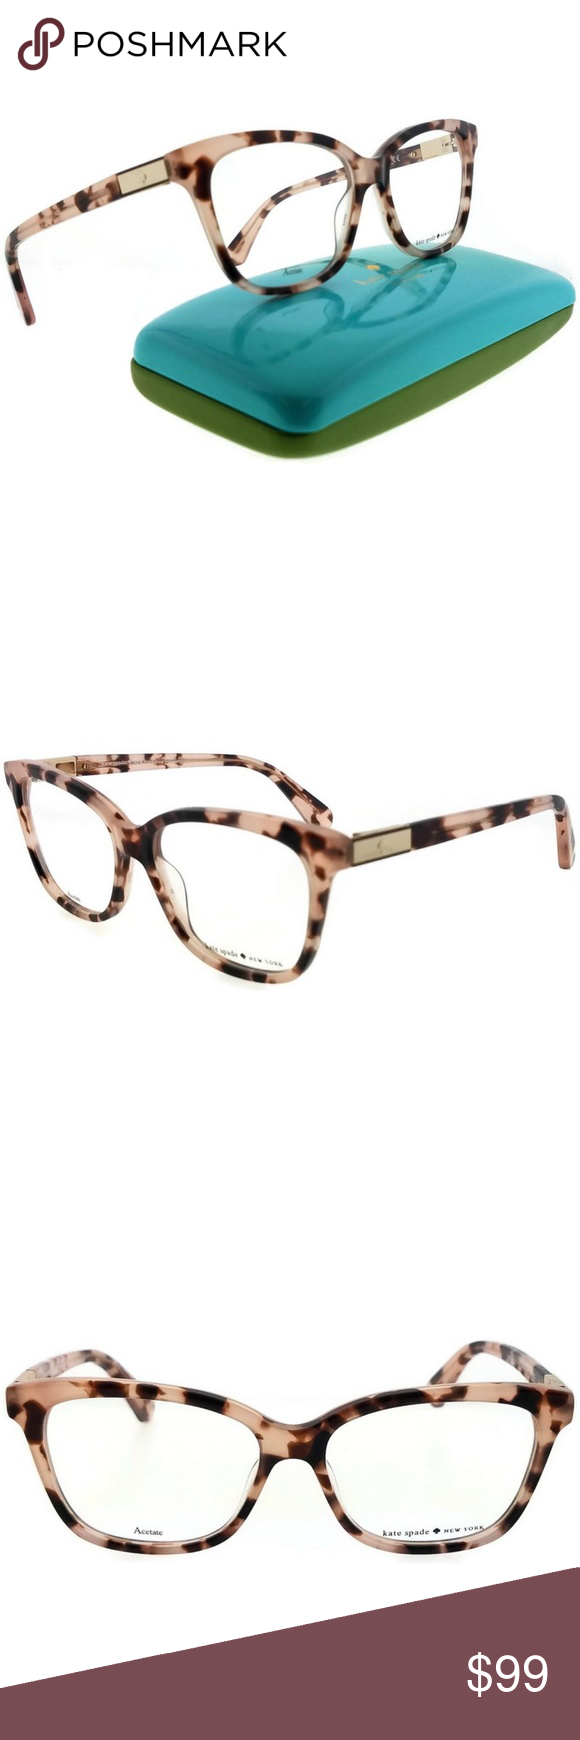 2829436d516d JORJA-0HT8-53 Kate Spade Eyeglasses Kate Spade JORJA-0HT8-53 square ...